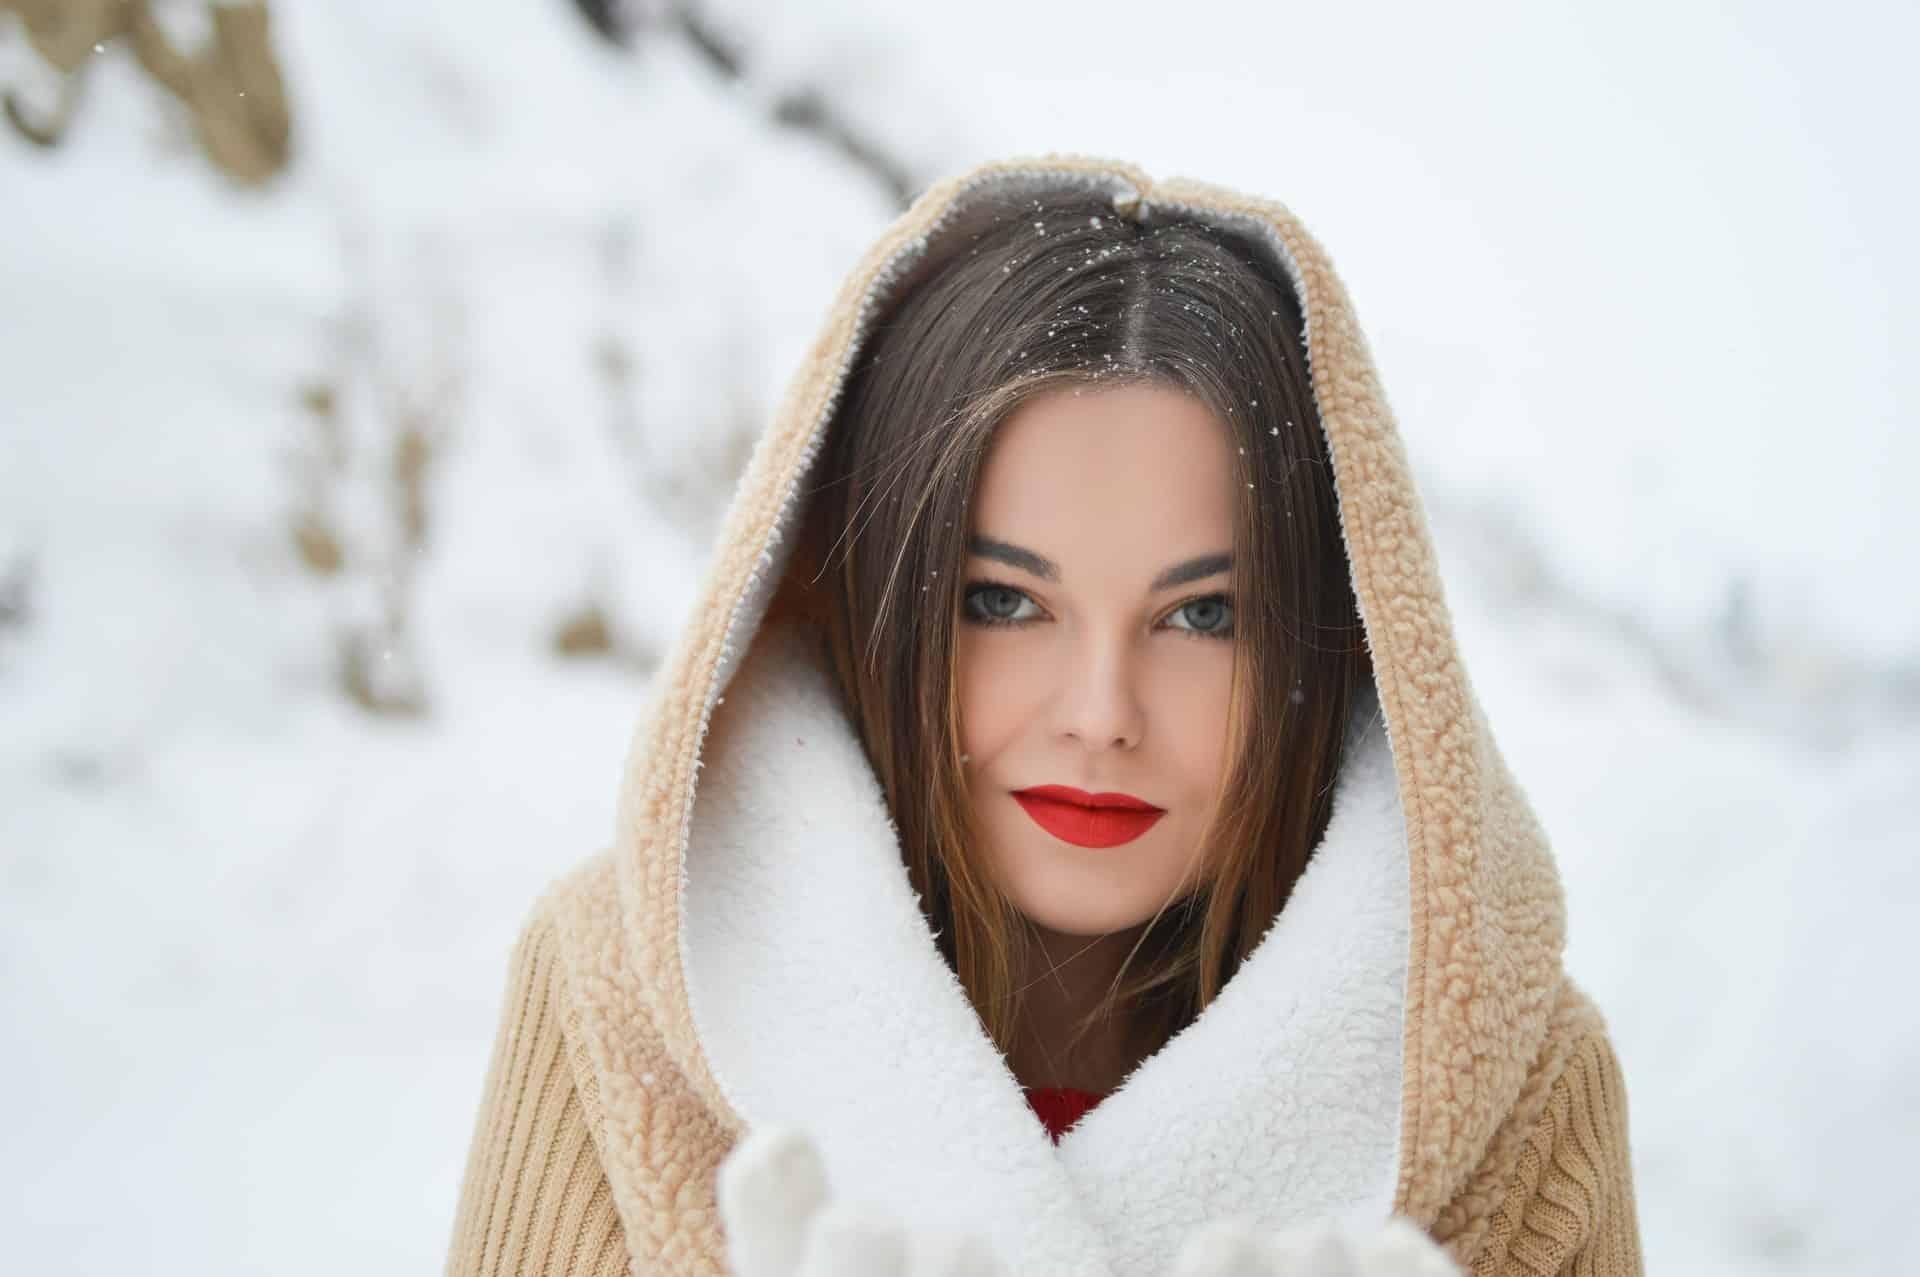 2020 Fashion Styles Winter Season Header Image